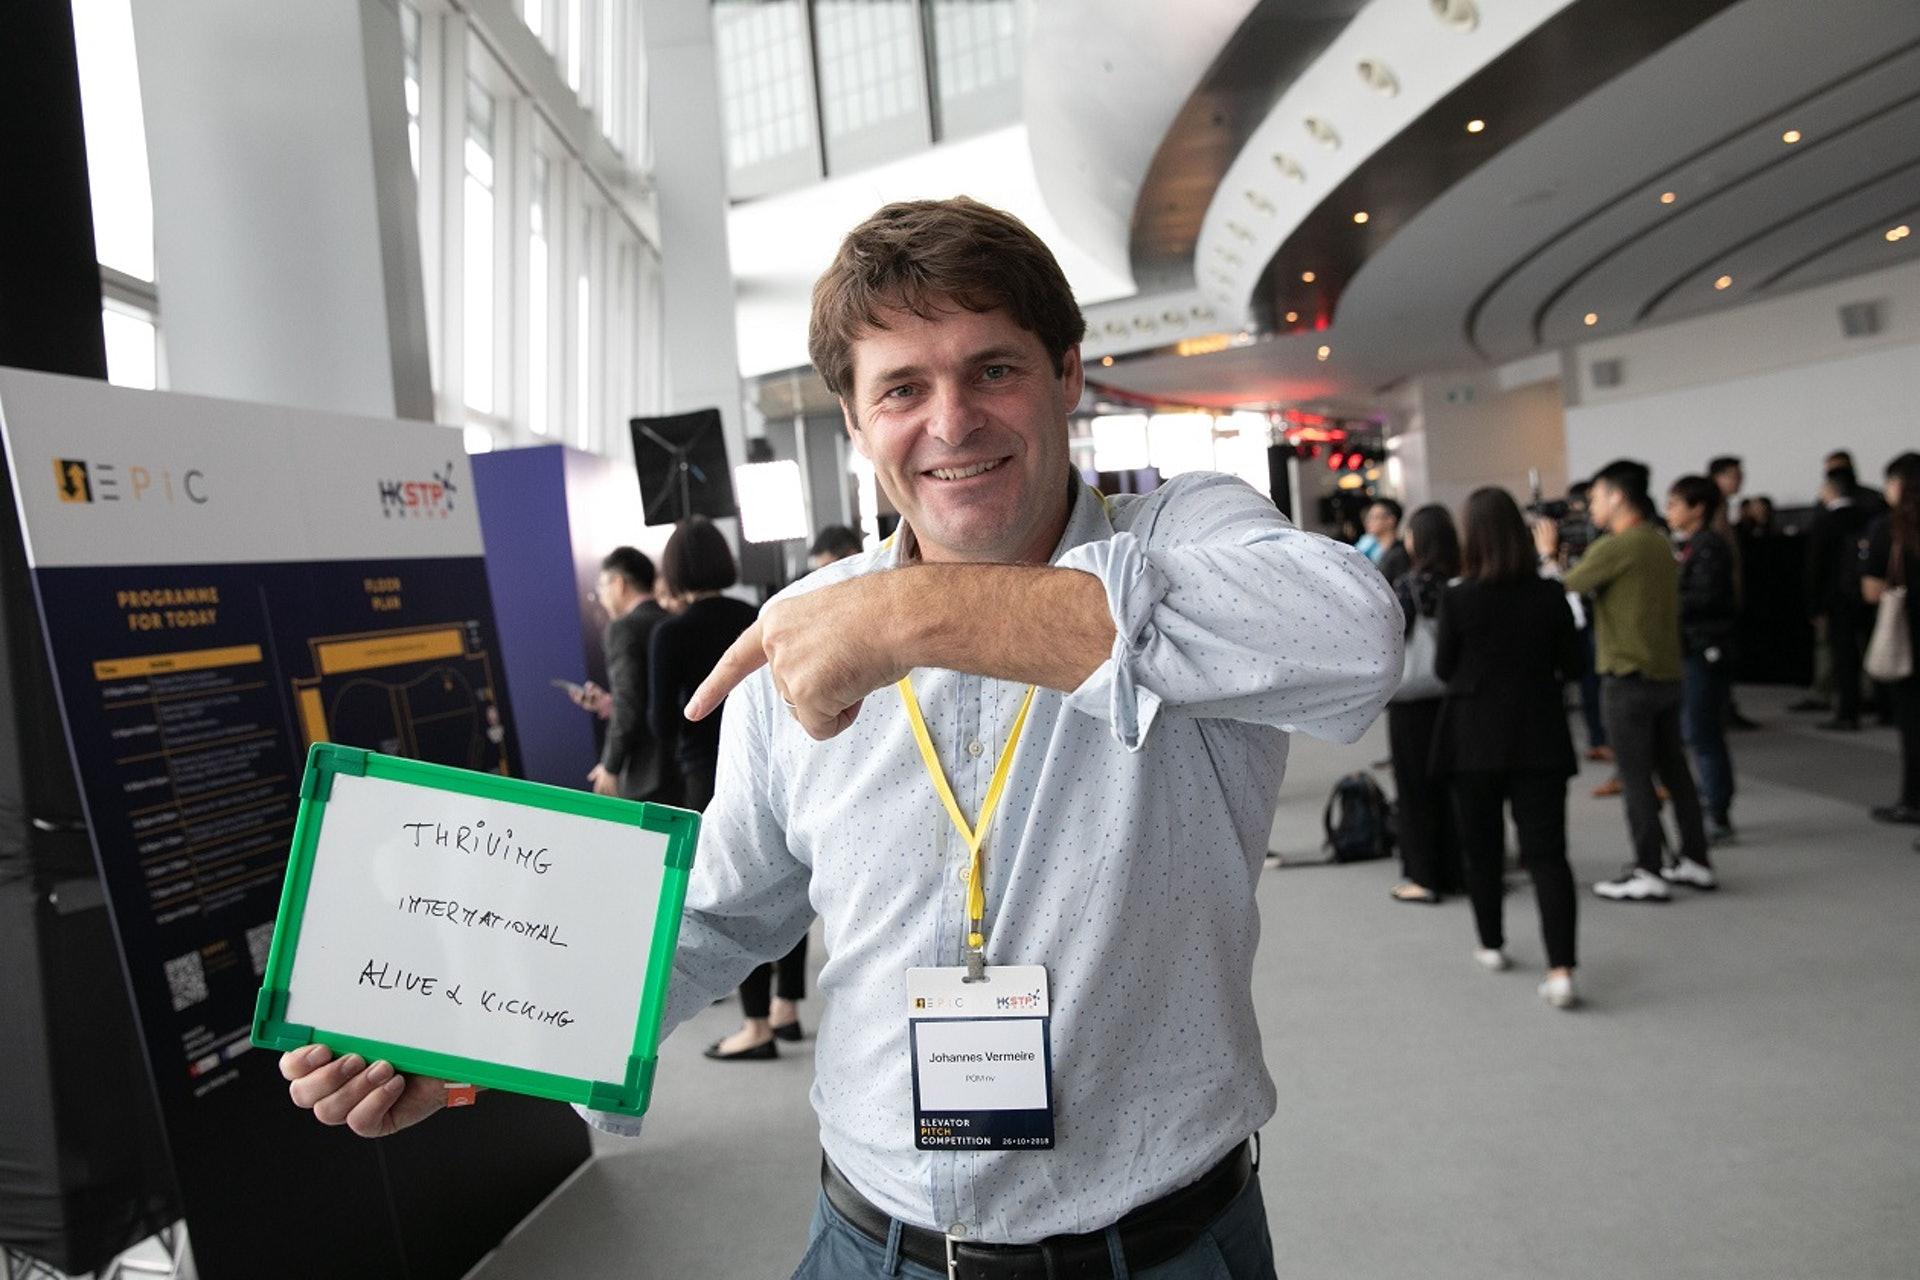 【Thriving、International、Alive & Kicking】首次體驗Elevator Pitch的比利時創企POM創辦人Johannes Vermeire對是次活動大感興奮,並在是次來旅程中爭取了與一些亞洲單位洽談的機會,亦對香港發展創科事業抱持積極態度。